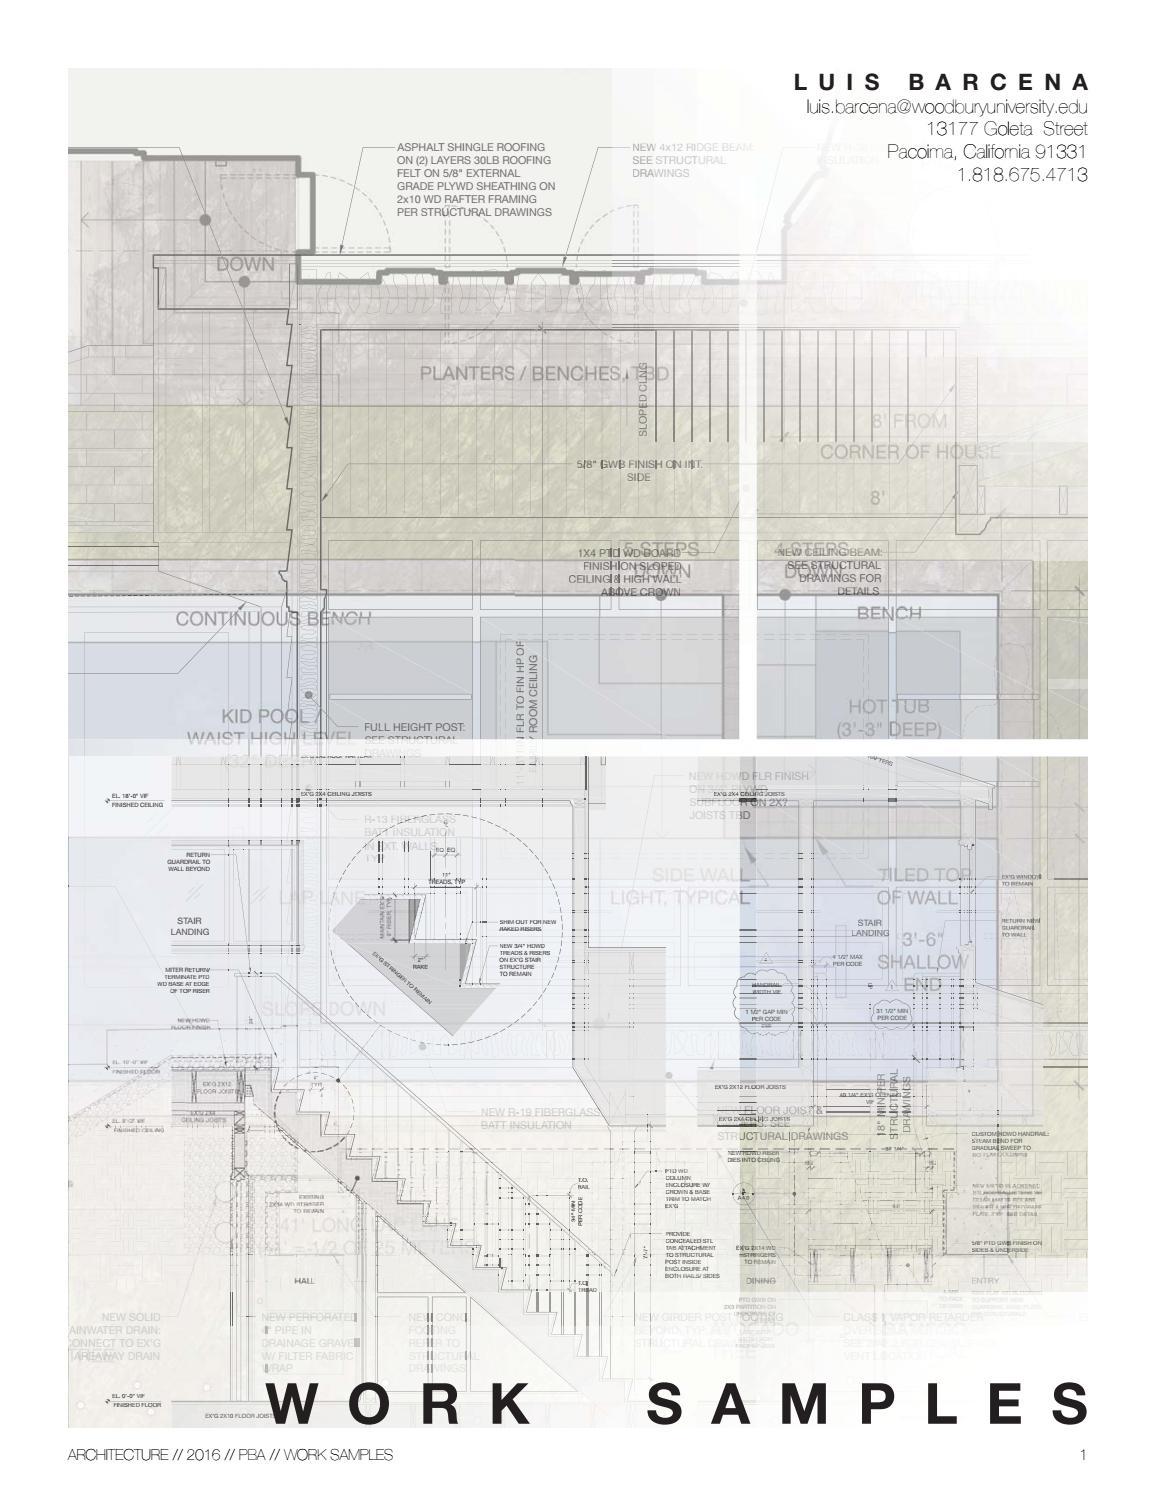 Luis Barcena Work Samples by Luis Barcena - issuu